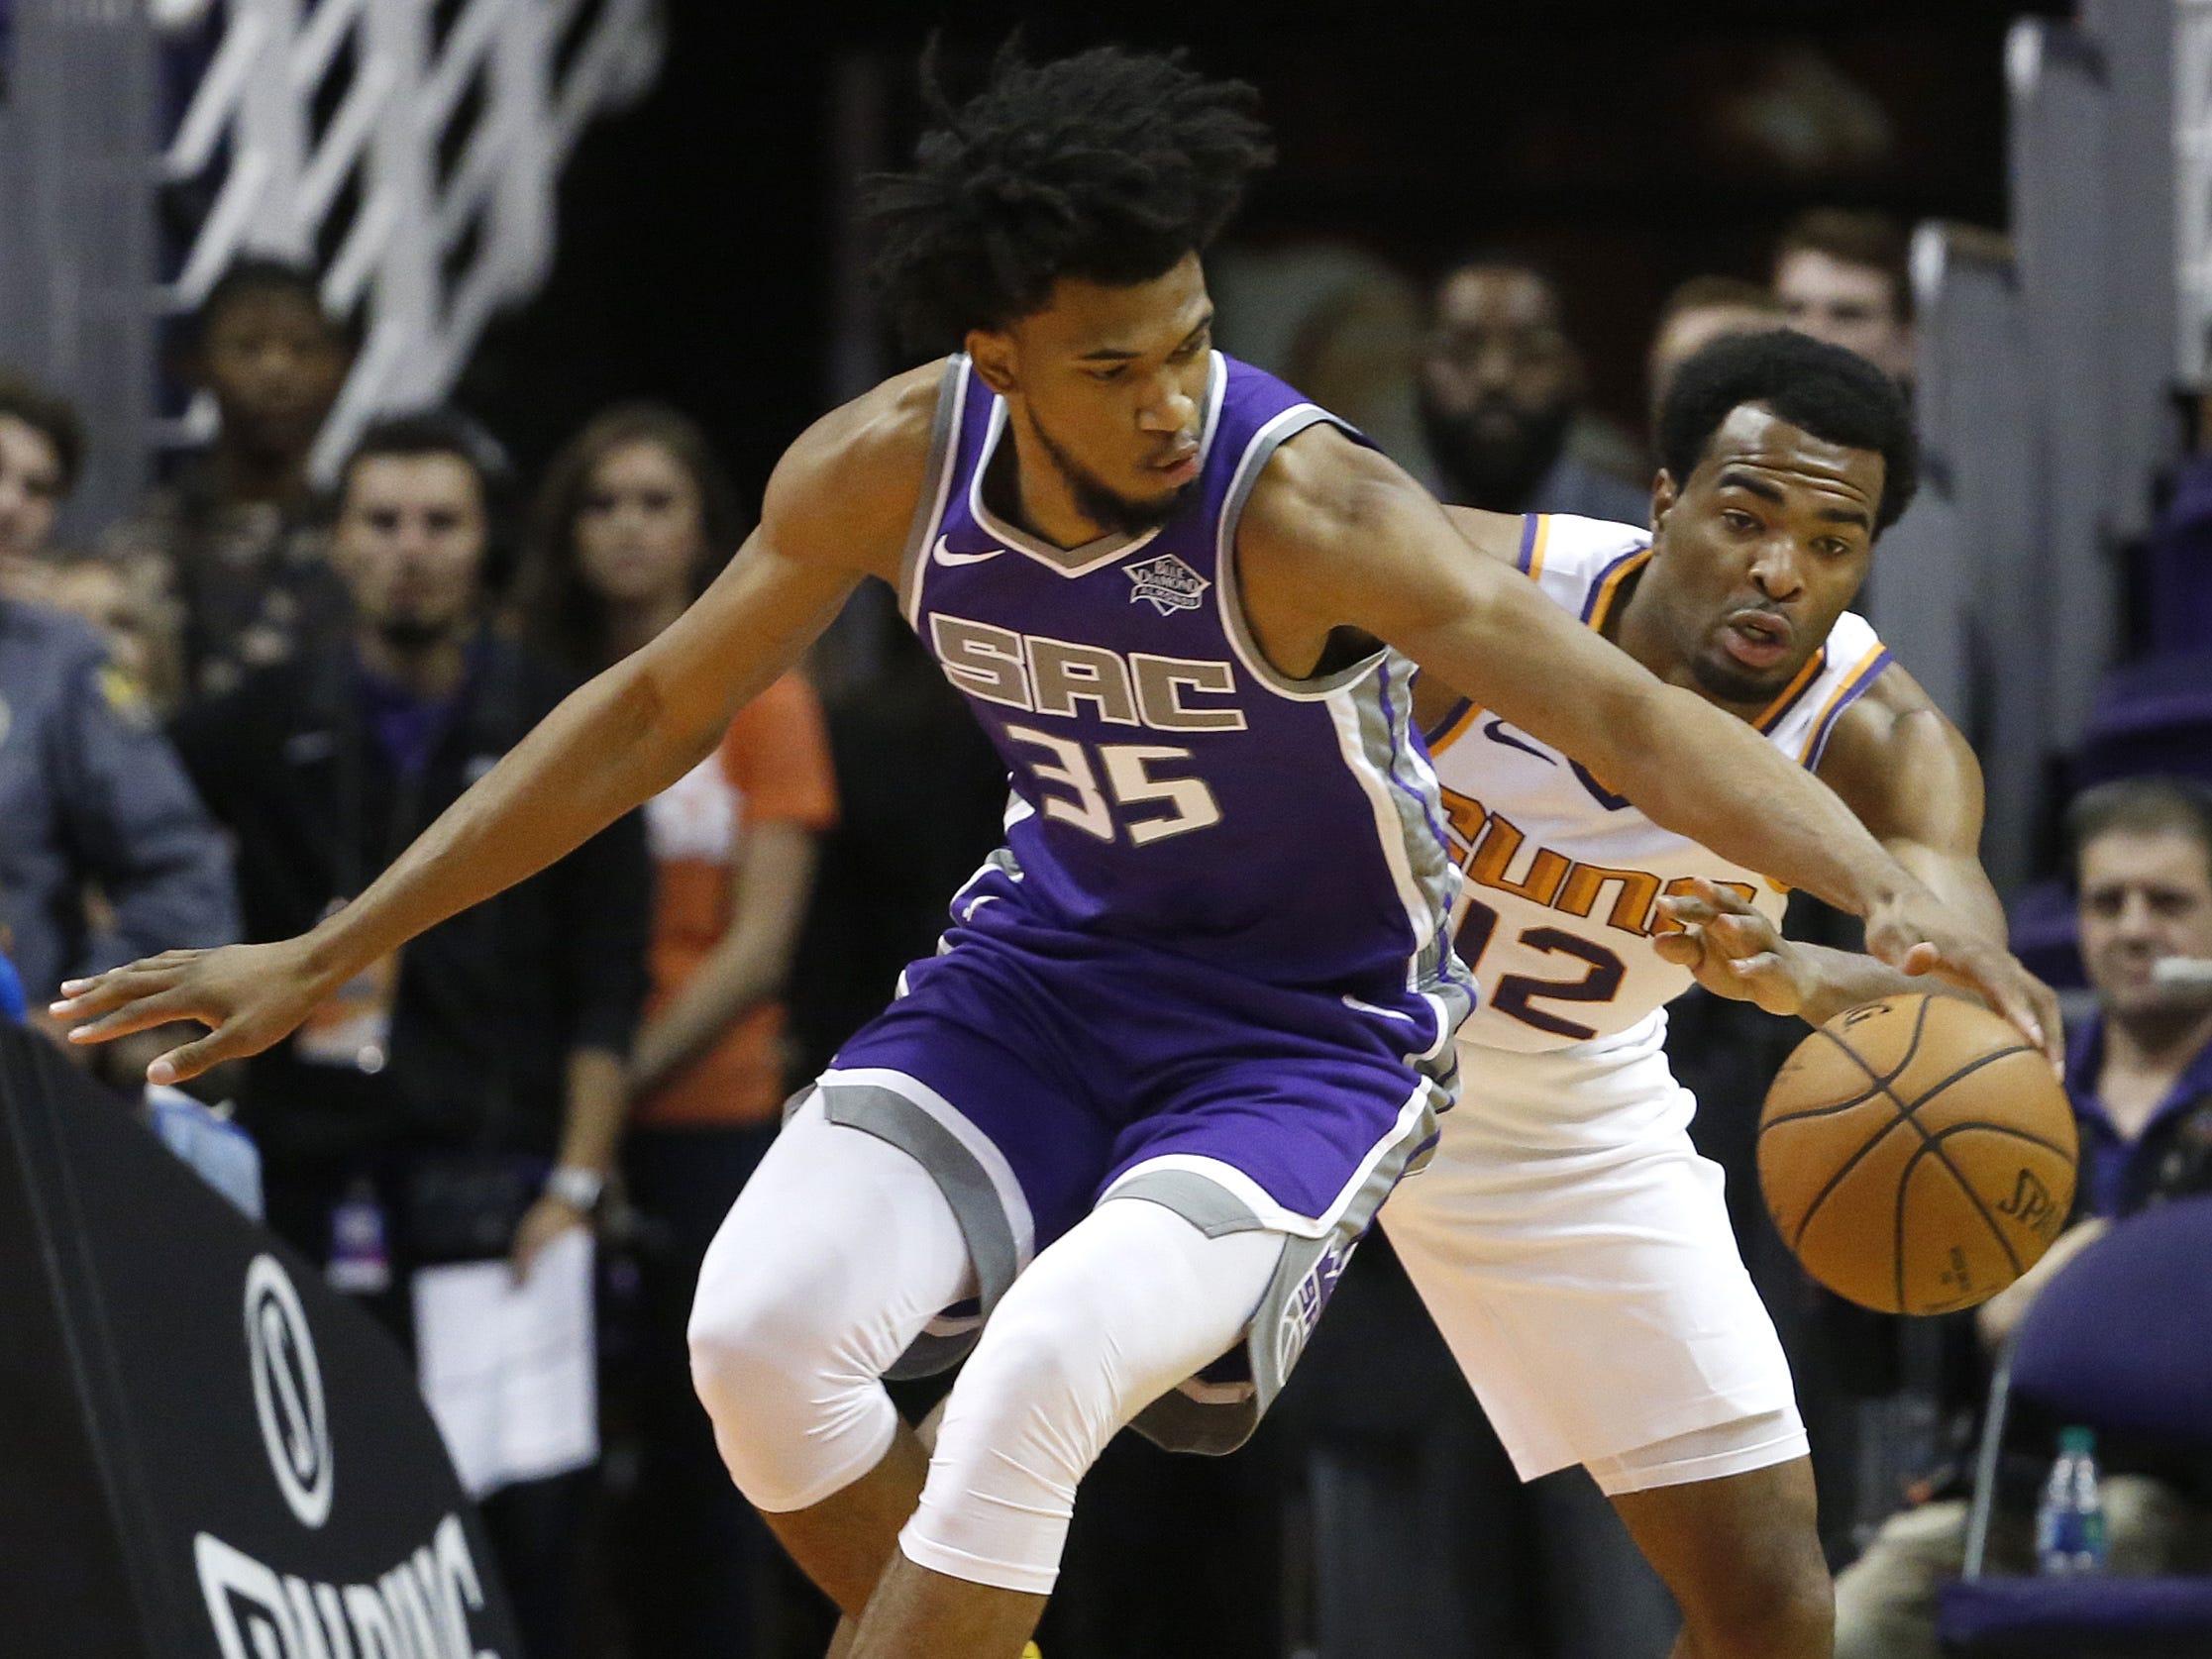 Suns TJ Warren (12) defends Kings Marvin Bagley III (35) during the first half at Talking Stick Resort Arena in Phoenix, Ariz. on October 1, 2018.